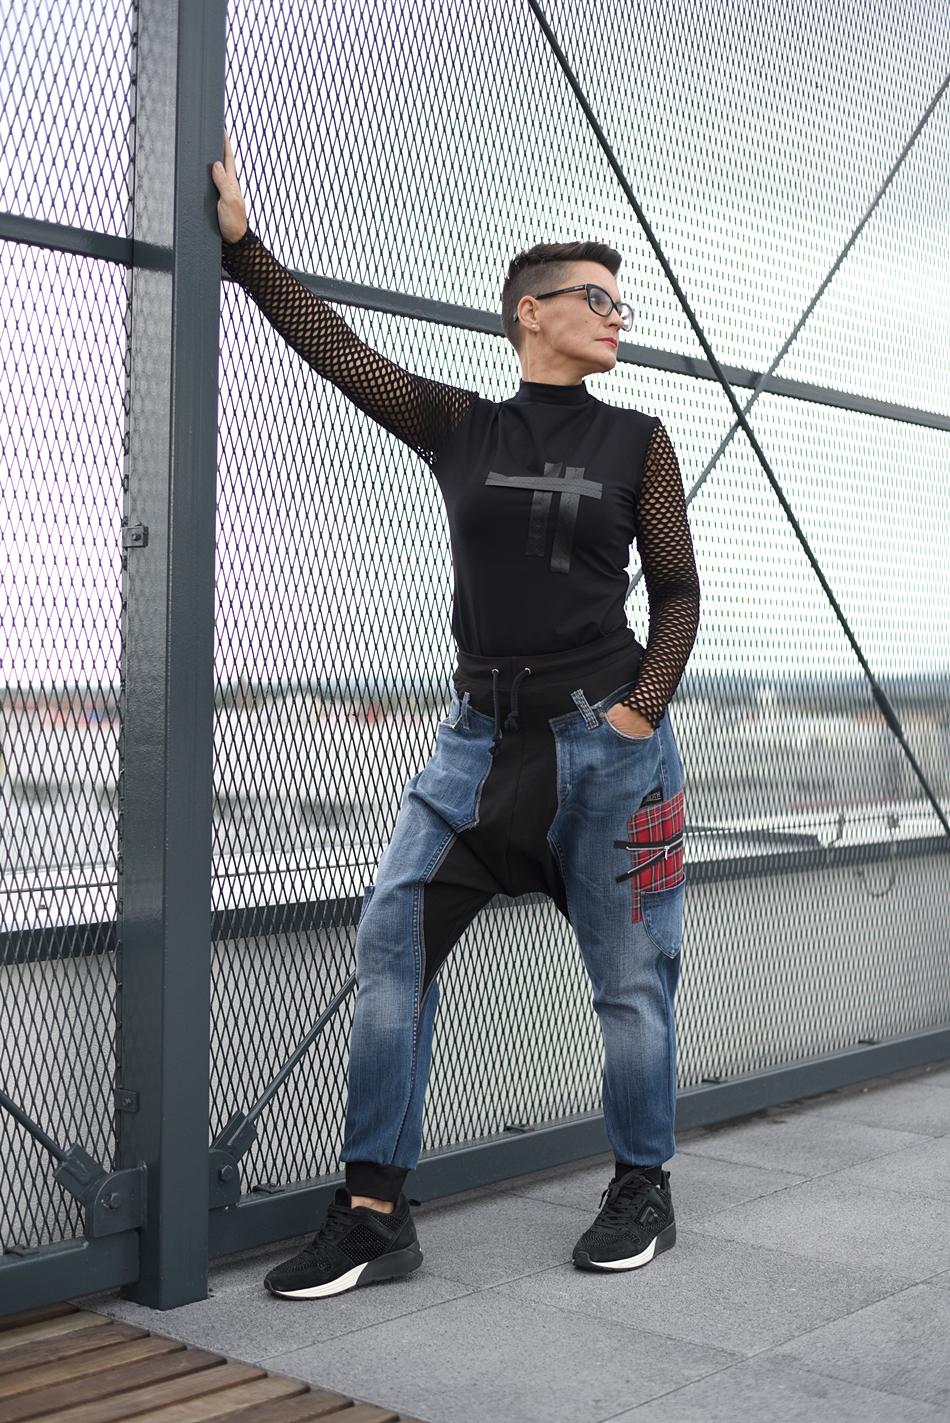 Broth_design_clothes_099